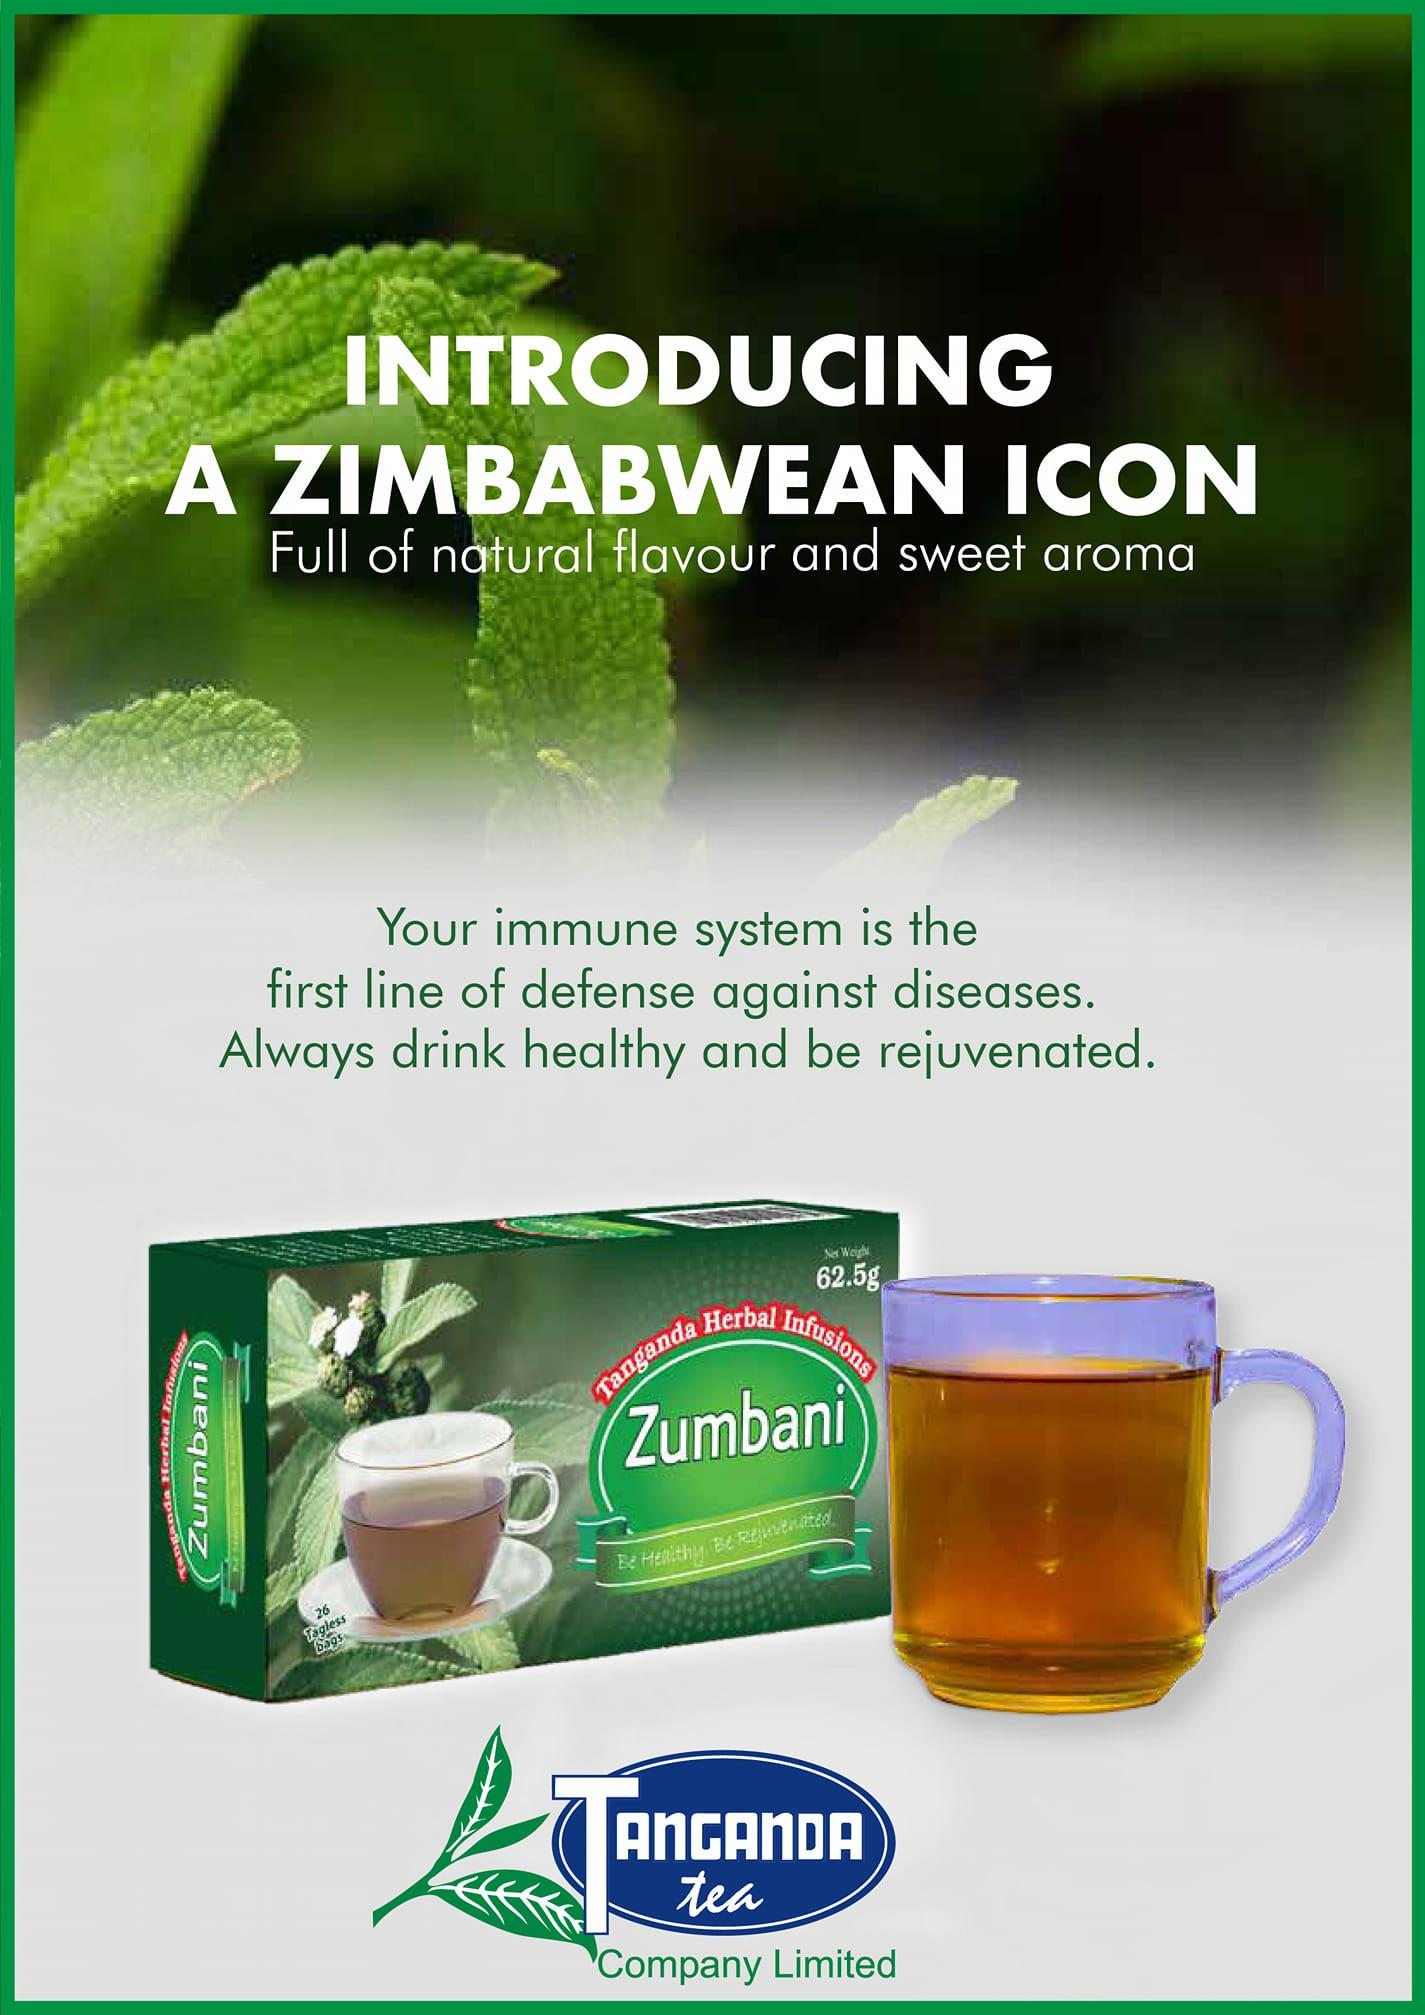 Tanganda Starts Selling Zumbani Tea